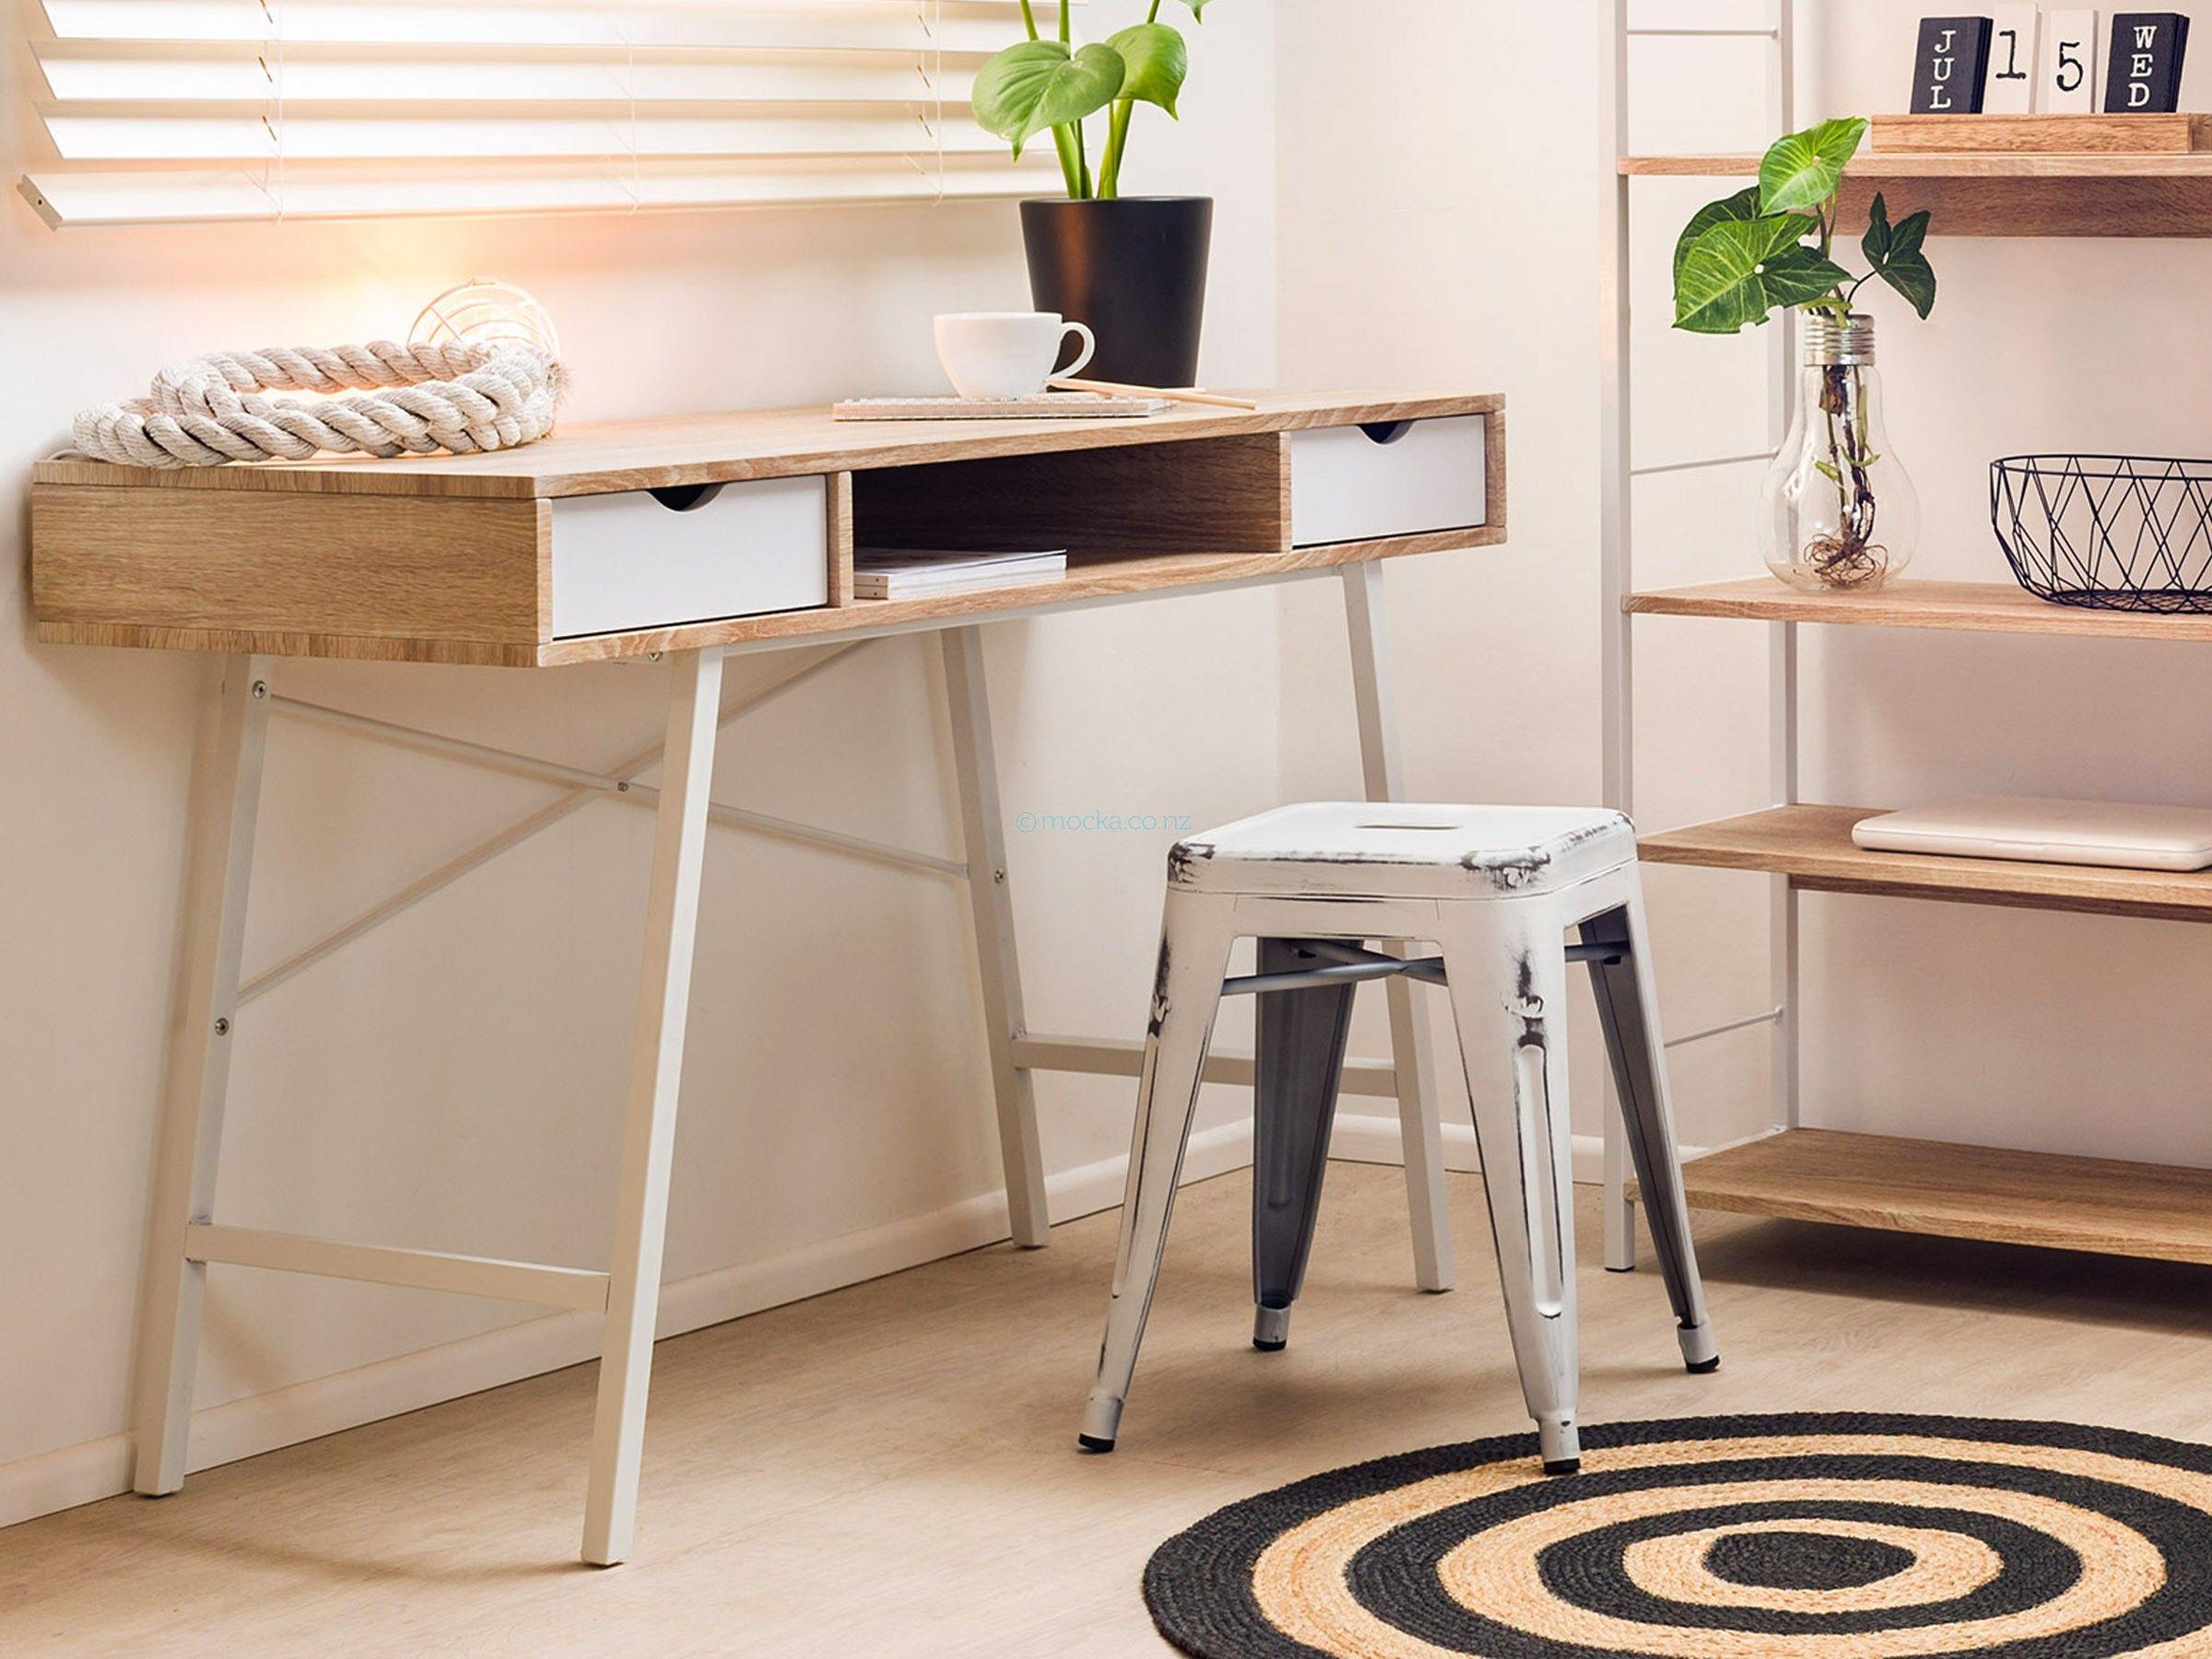 Http Www Mocka Co Nz Vigo Desk Html Design Pinterest Desks  # Muebles Qka Vigo